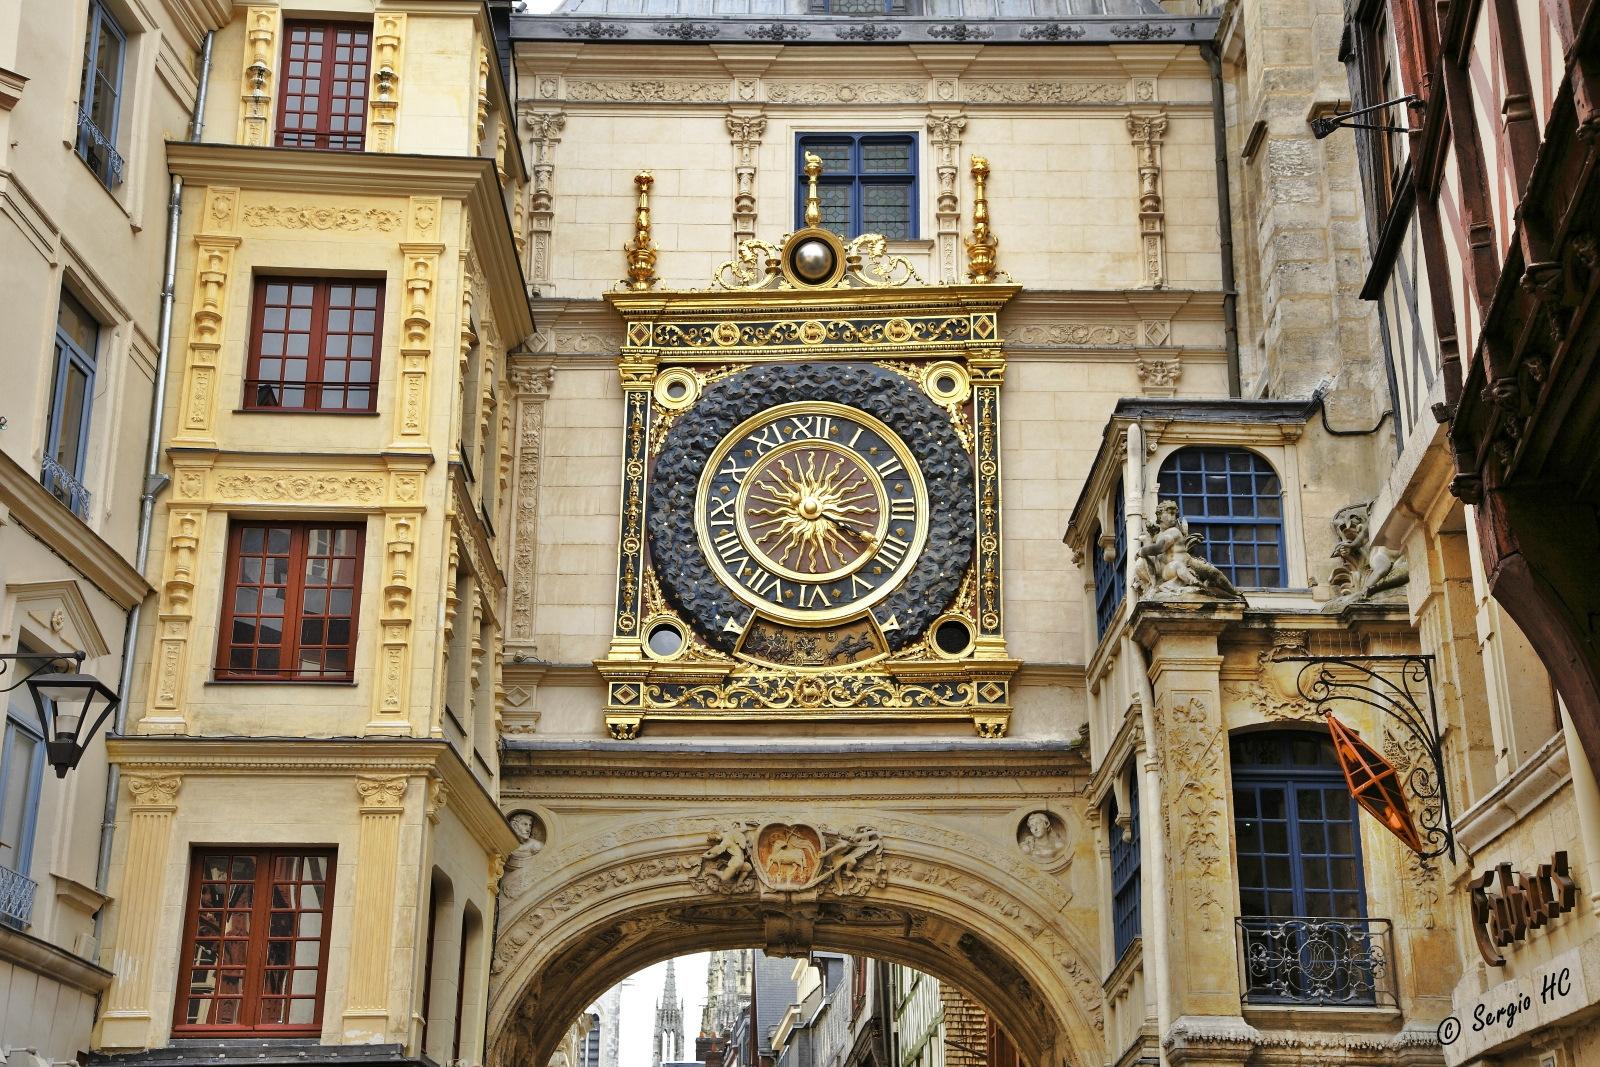 Normandia cosa vedere - Rouen Gros-Horloge @Sergio Herreria via flickr